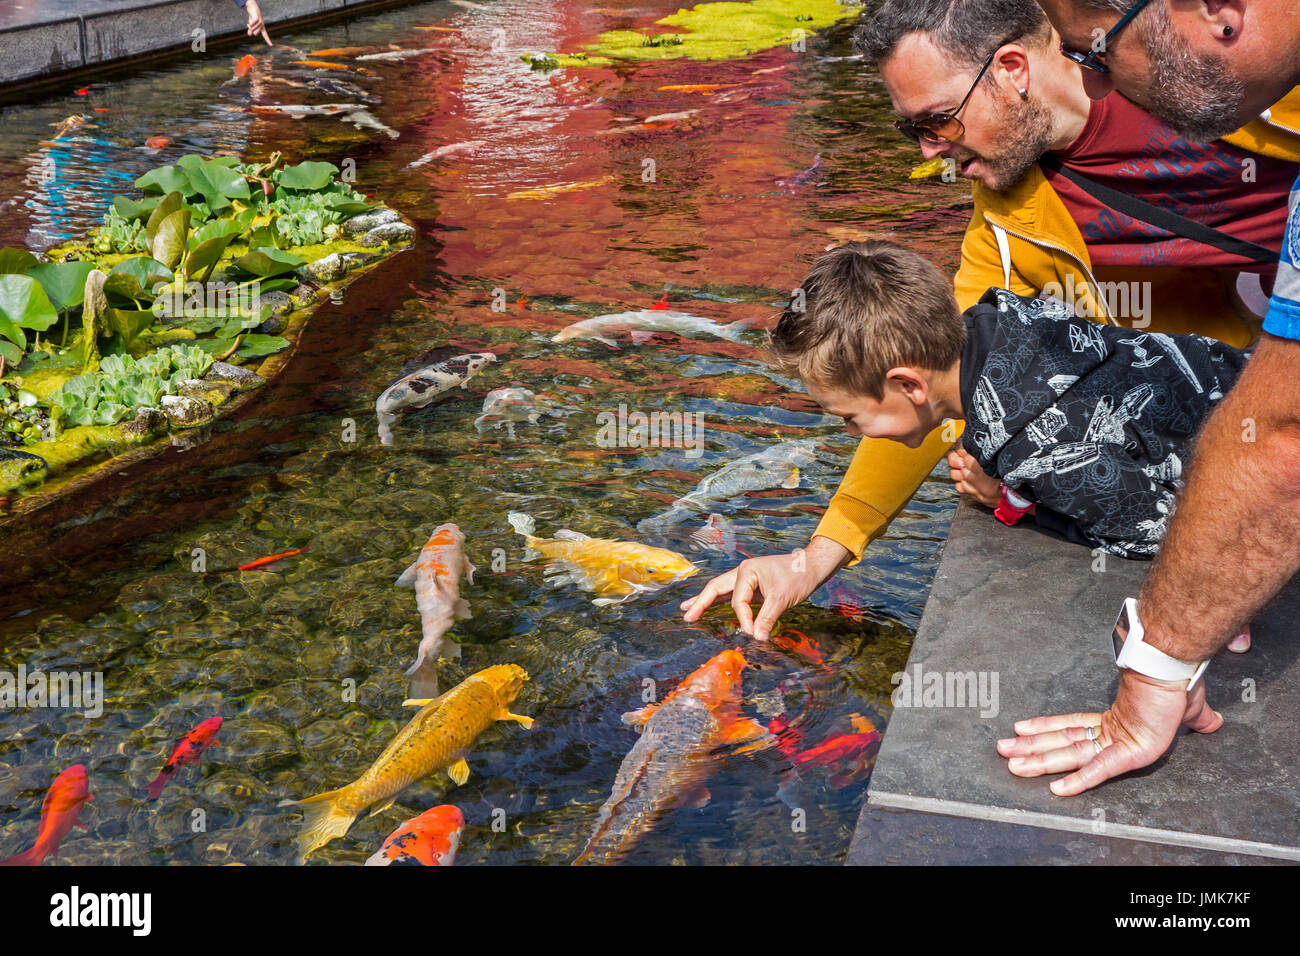 tourists-with-child-feeding-colourful-koi-fish-cyprinus-rubrofuscus-JMK7KF.jpg